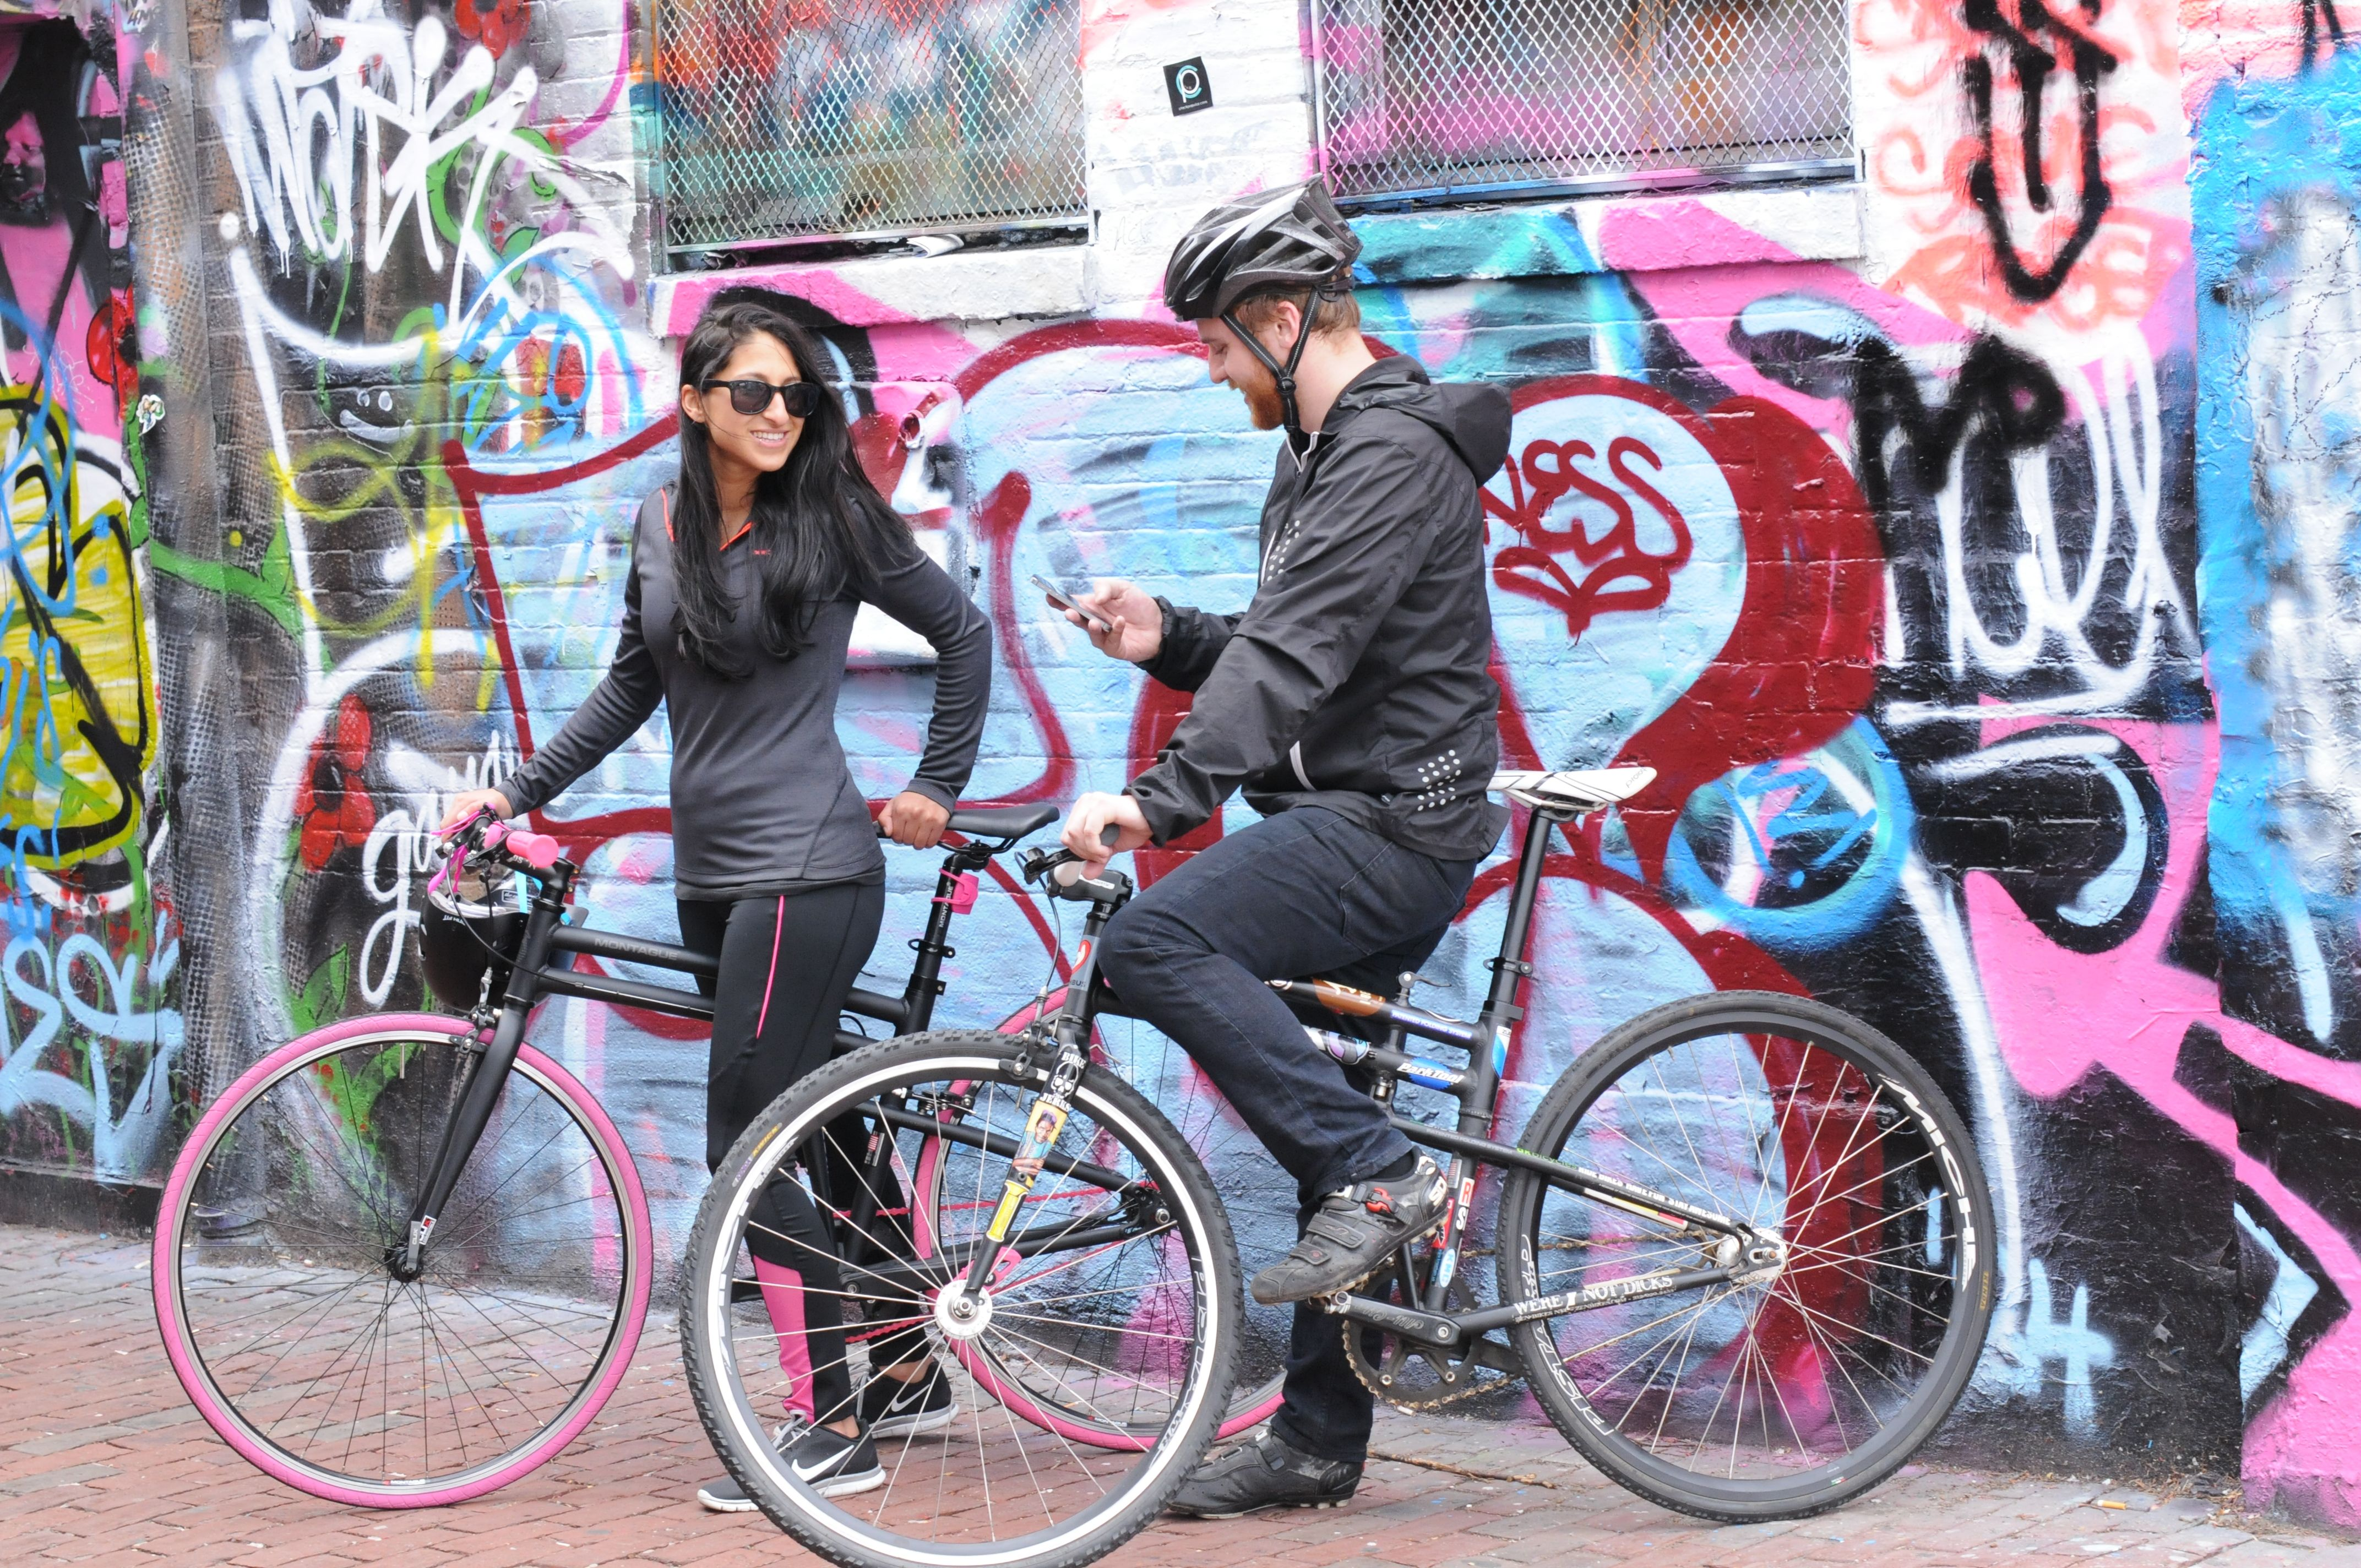 #montague #boston #realbikesthatfold #foldingbikes #sun #greatday #ilovemybike #fun #somuchfun #freedom